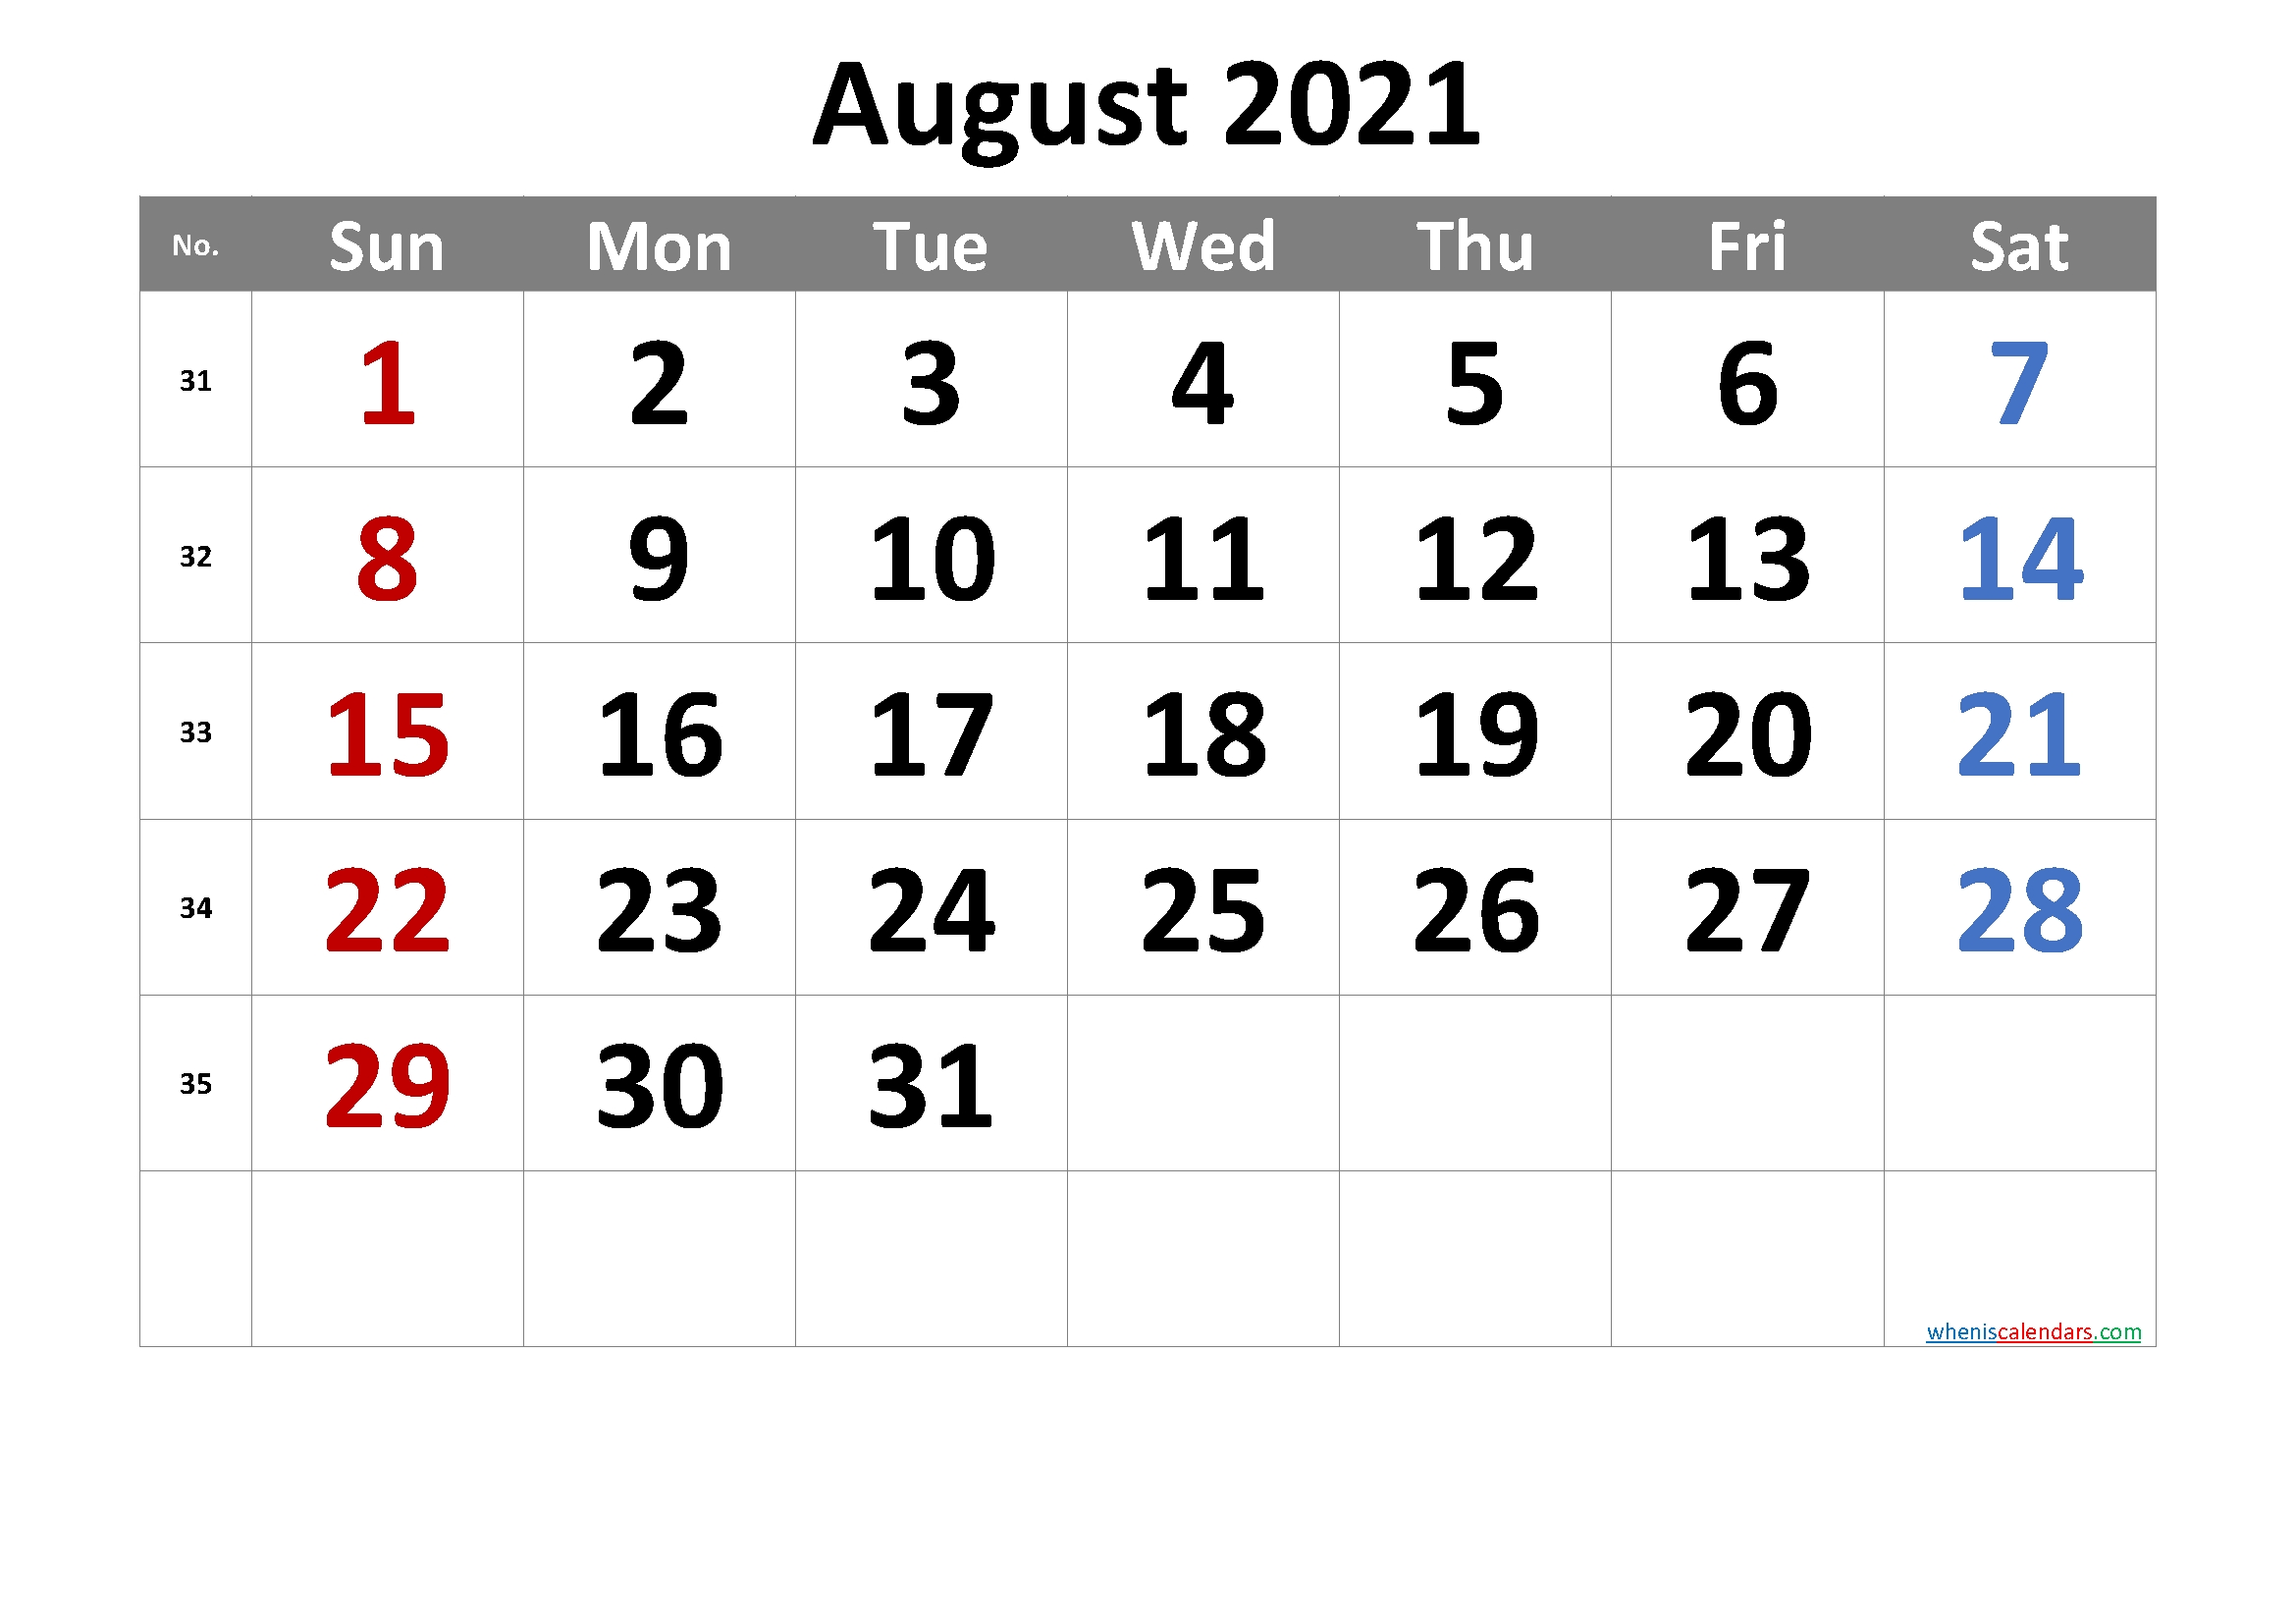 Free Printable August 2021 Calendar Free Calendars 2021 Word Doc Printable August